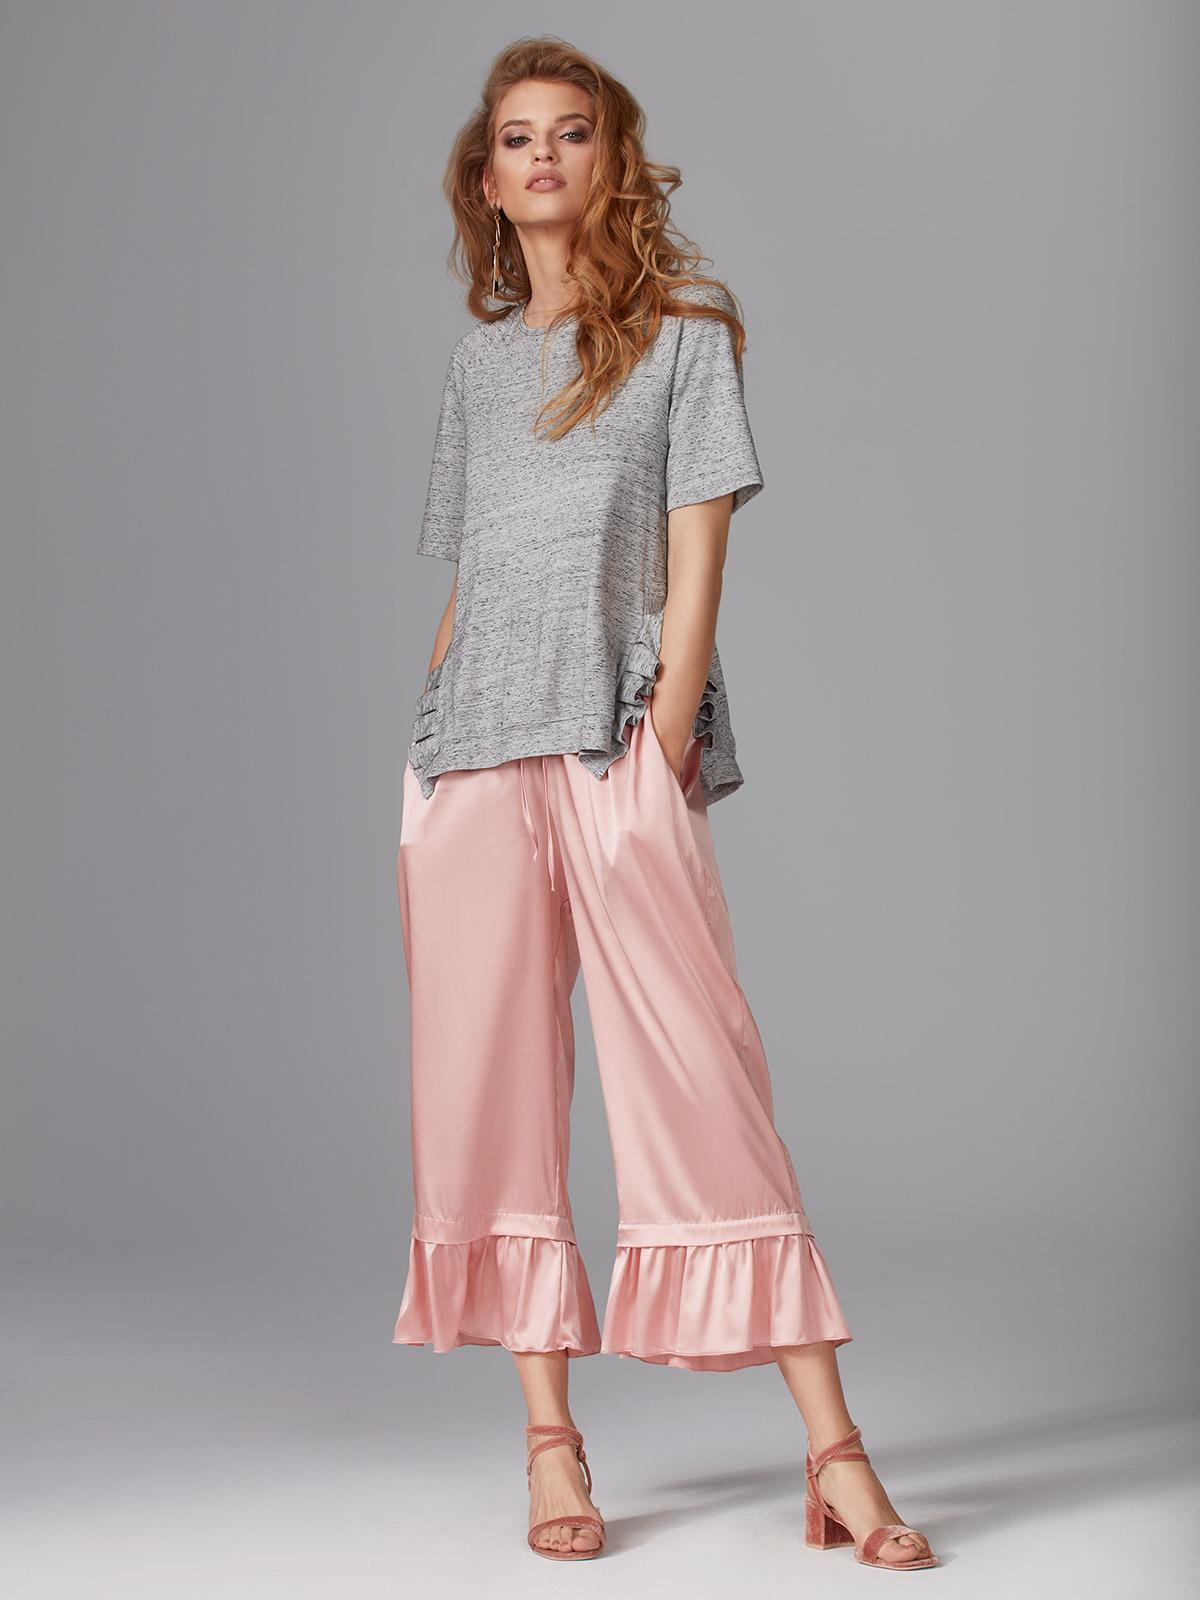 Wish It OZ015 T-shirt<br />02 Black, 60 Ash<br />60's Heritage OZ016 Pantalone Seta<br />01 Ivory, 02 Black, 64 Dusty Pink, 65 Silver